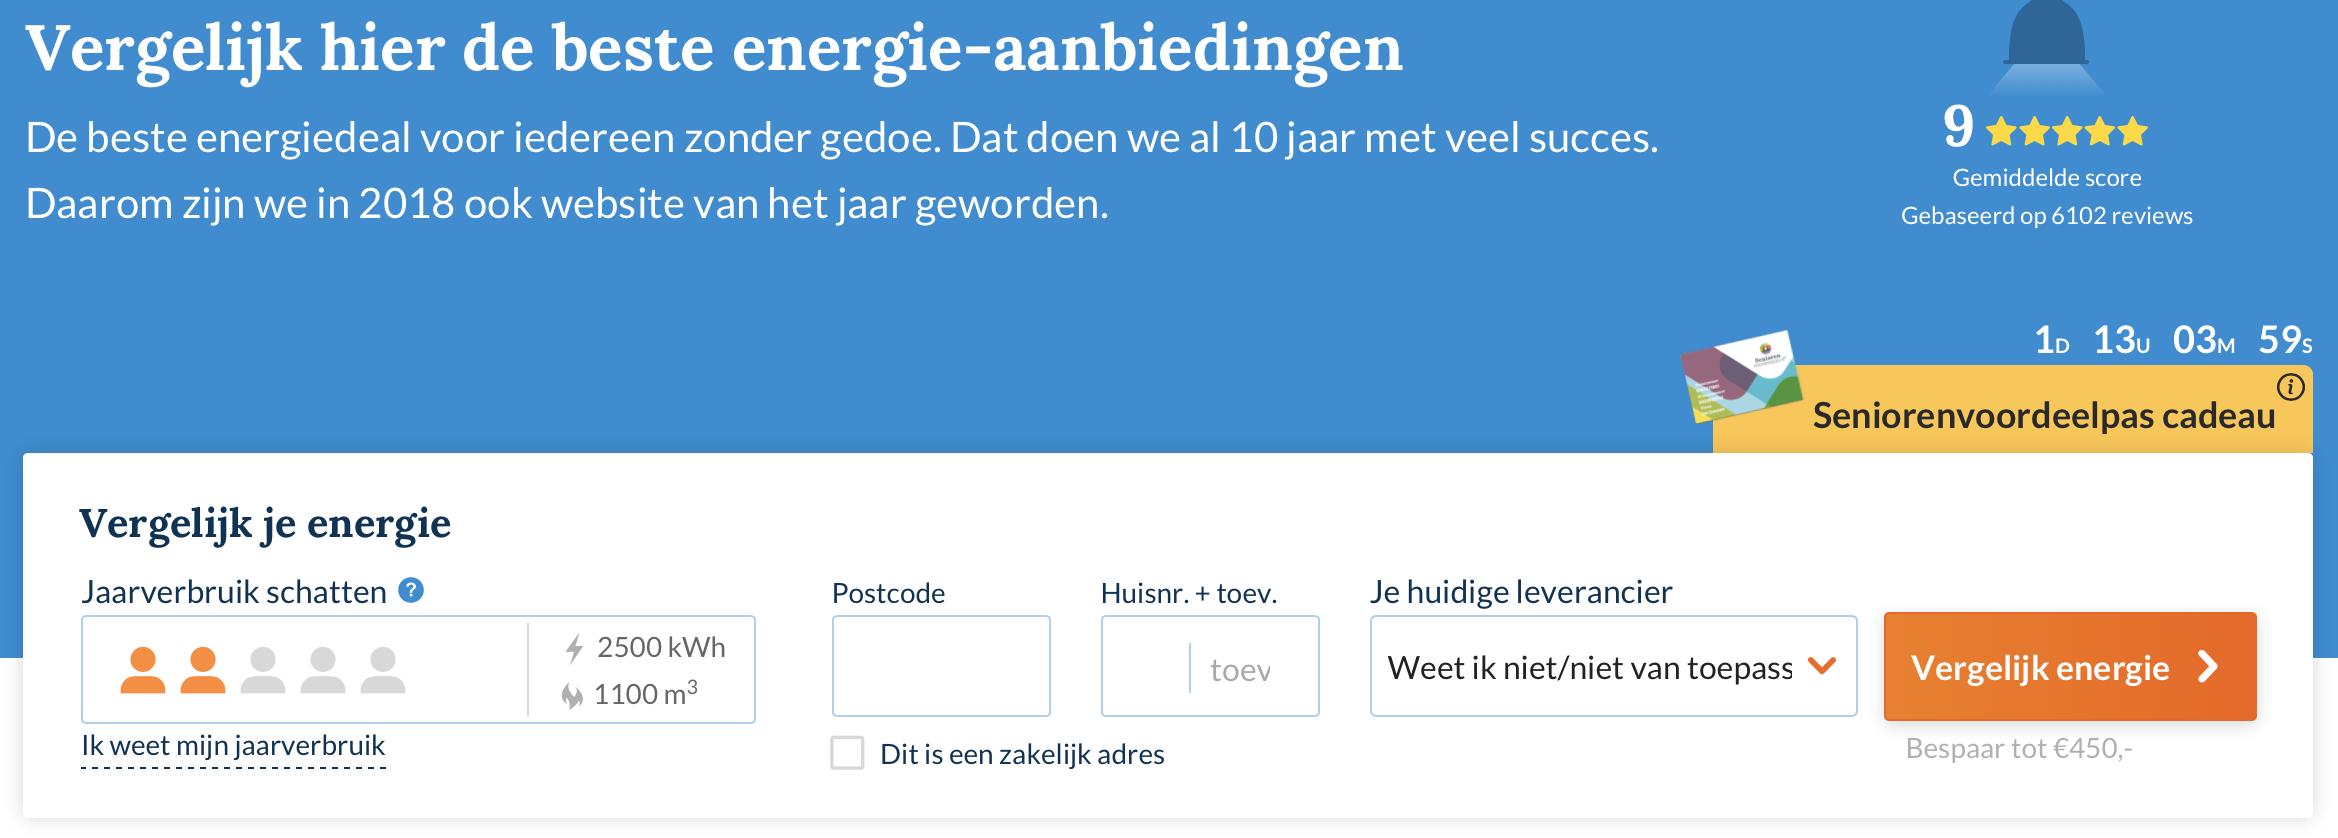 https://www.macfreak.nl/modules/news/images/zArt.easyswitch.nl.png